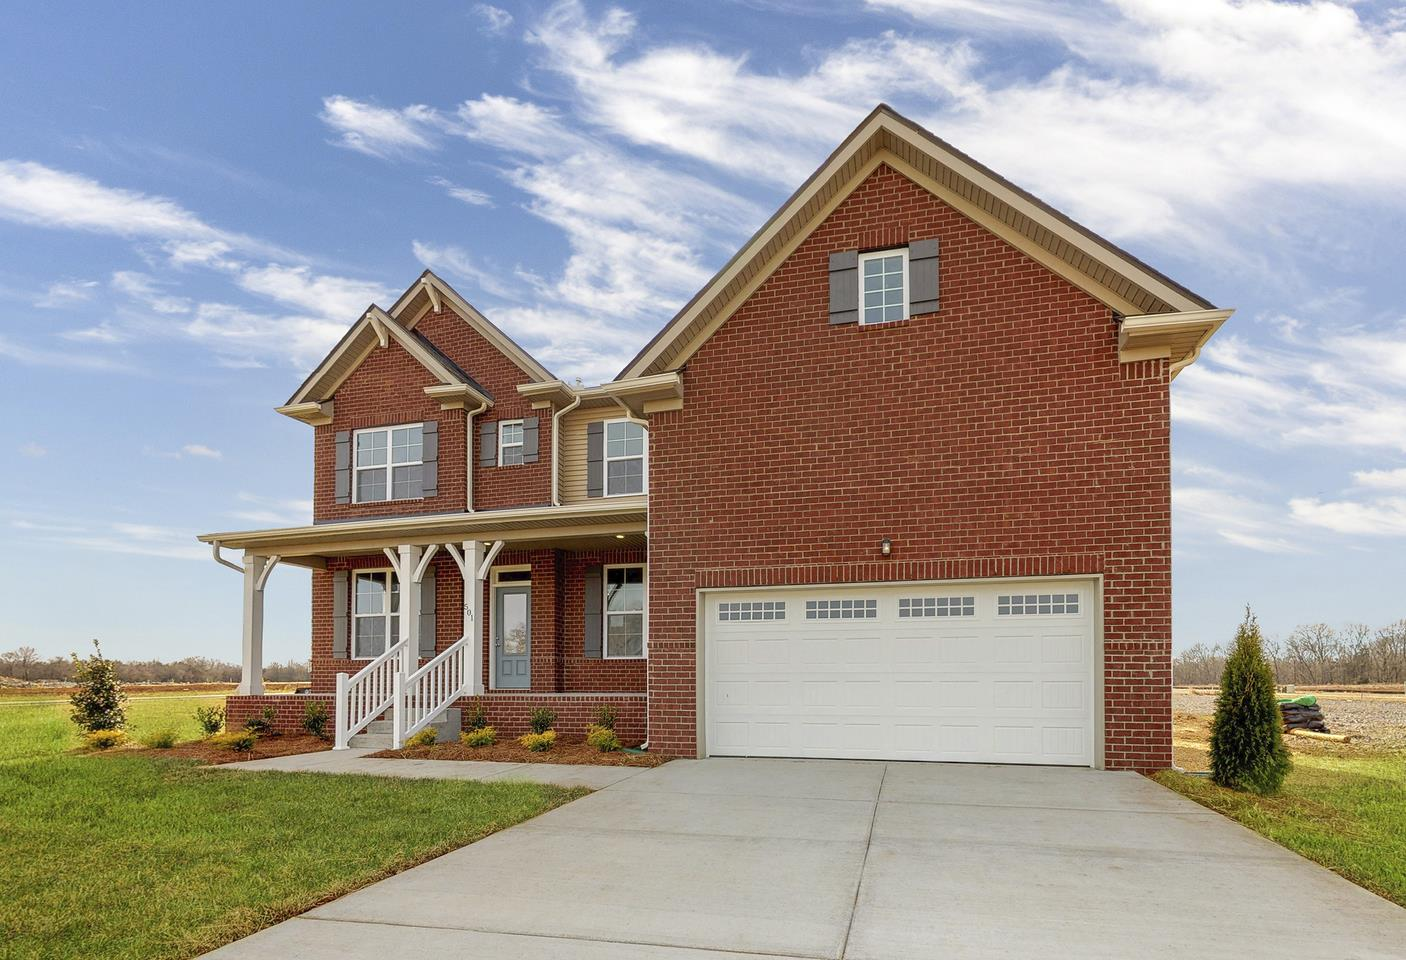 501 Davenport Drive Lot 19, Murfreesboro, TN 37128 - Murfreesboro, TN real estate listing